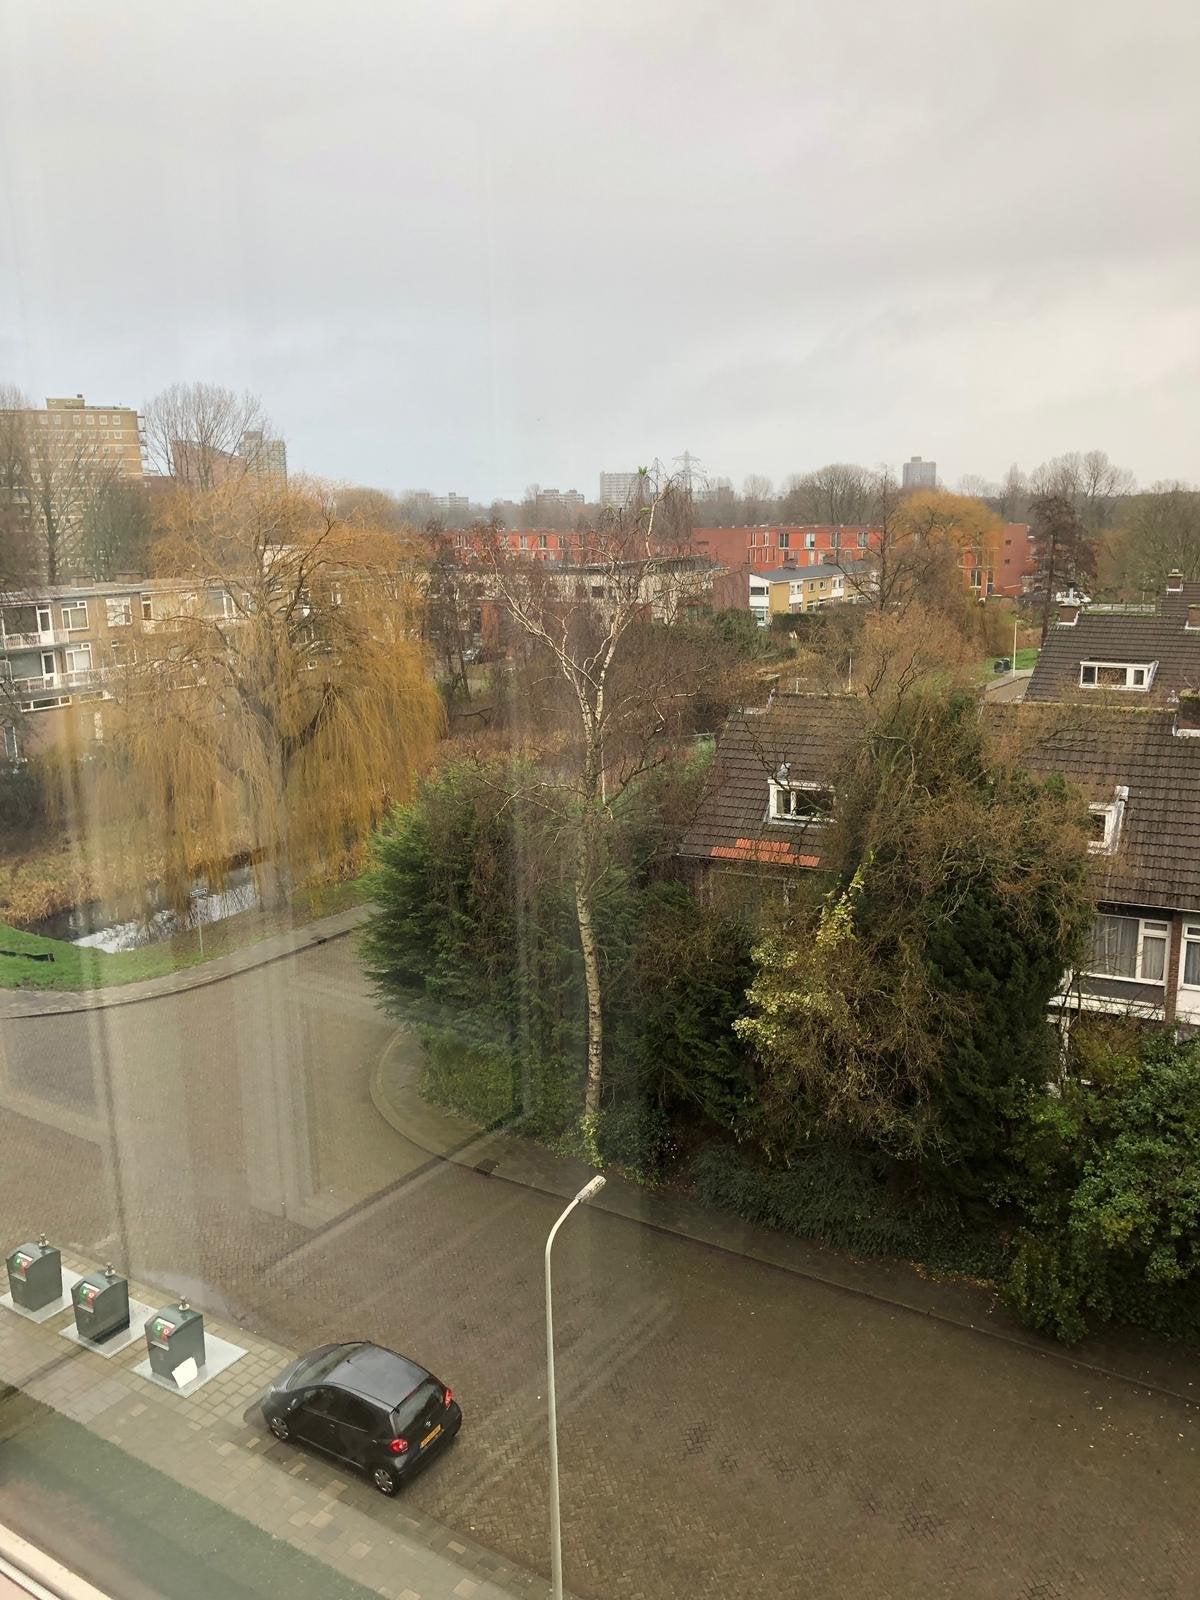 https://public.parariusoffice.nl/185/photos/huge/51881374.1547208233-205.jpg